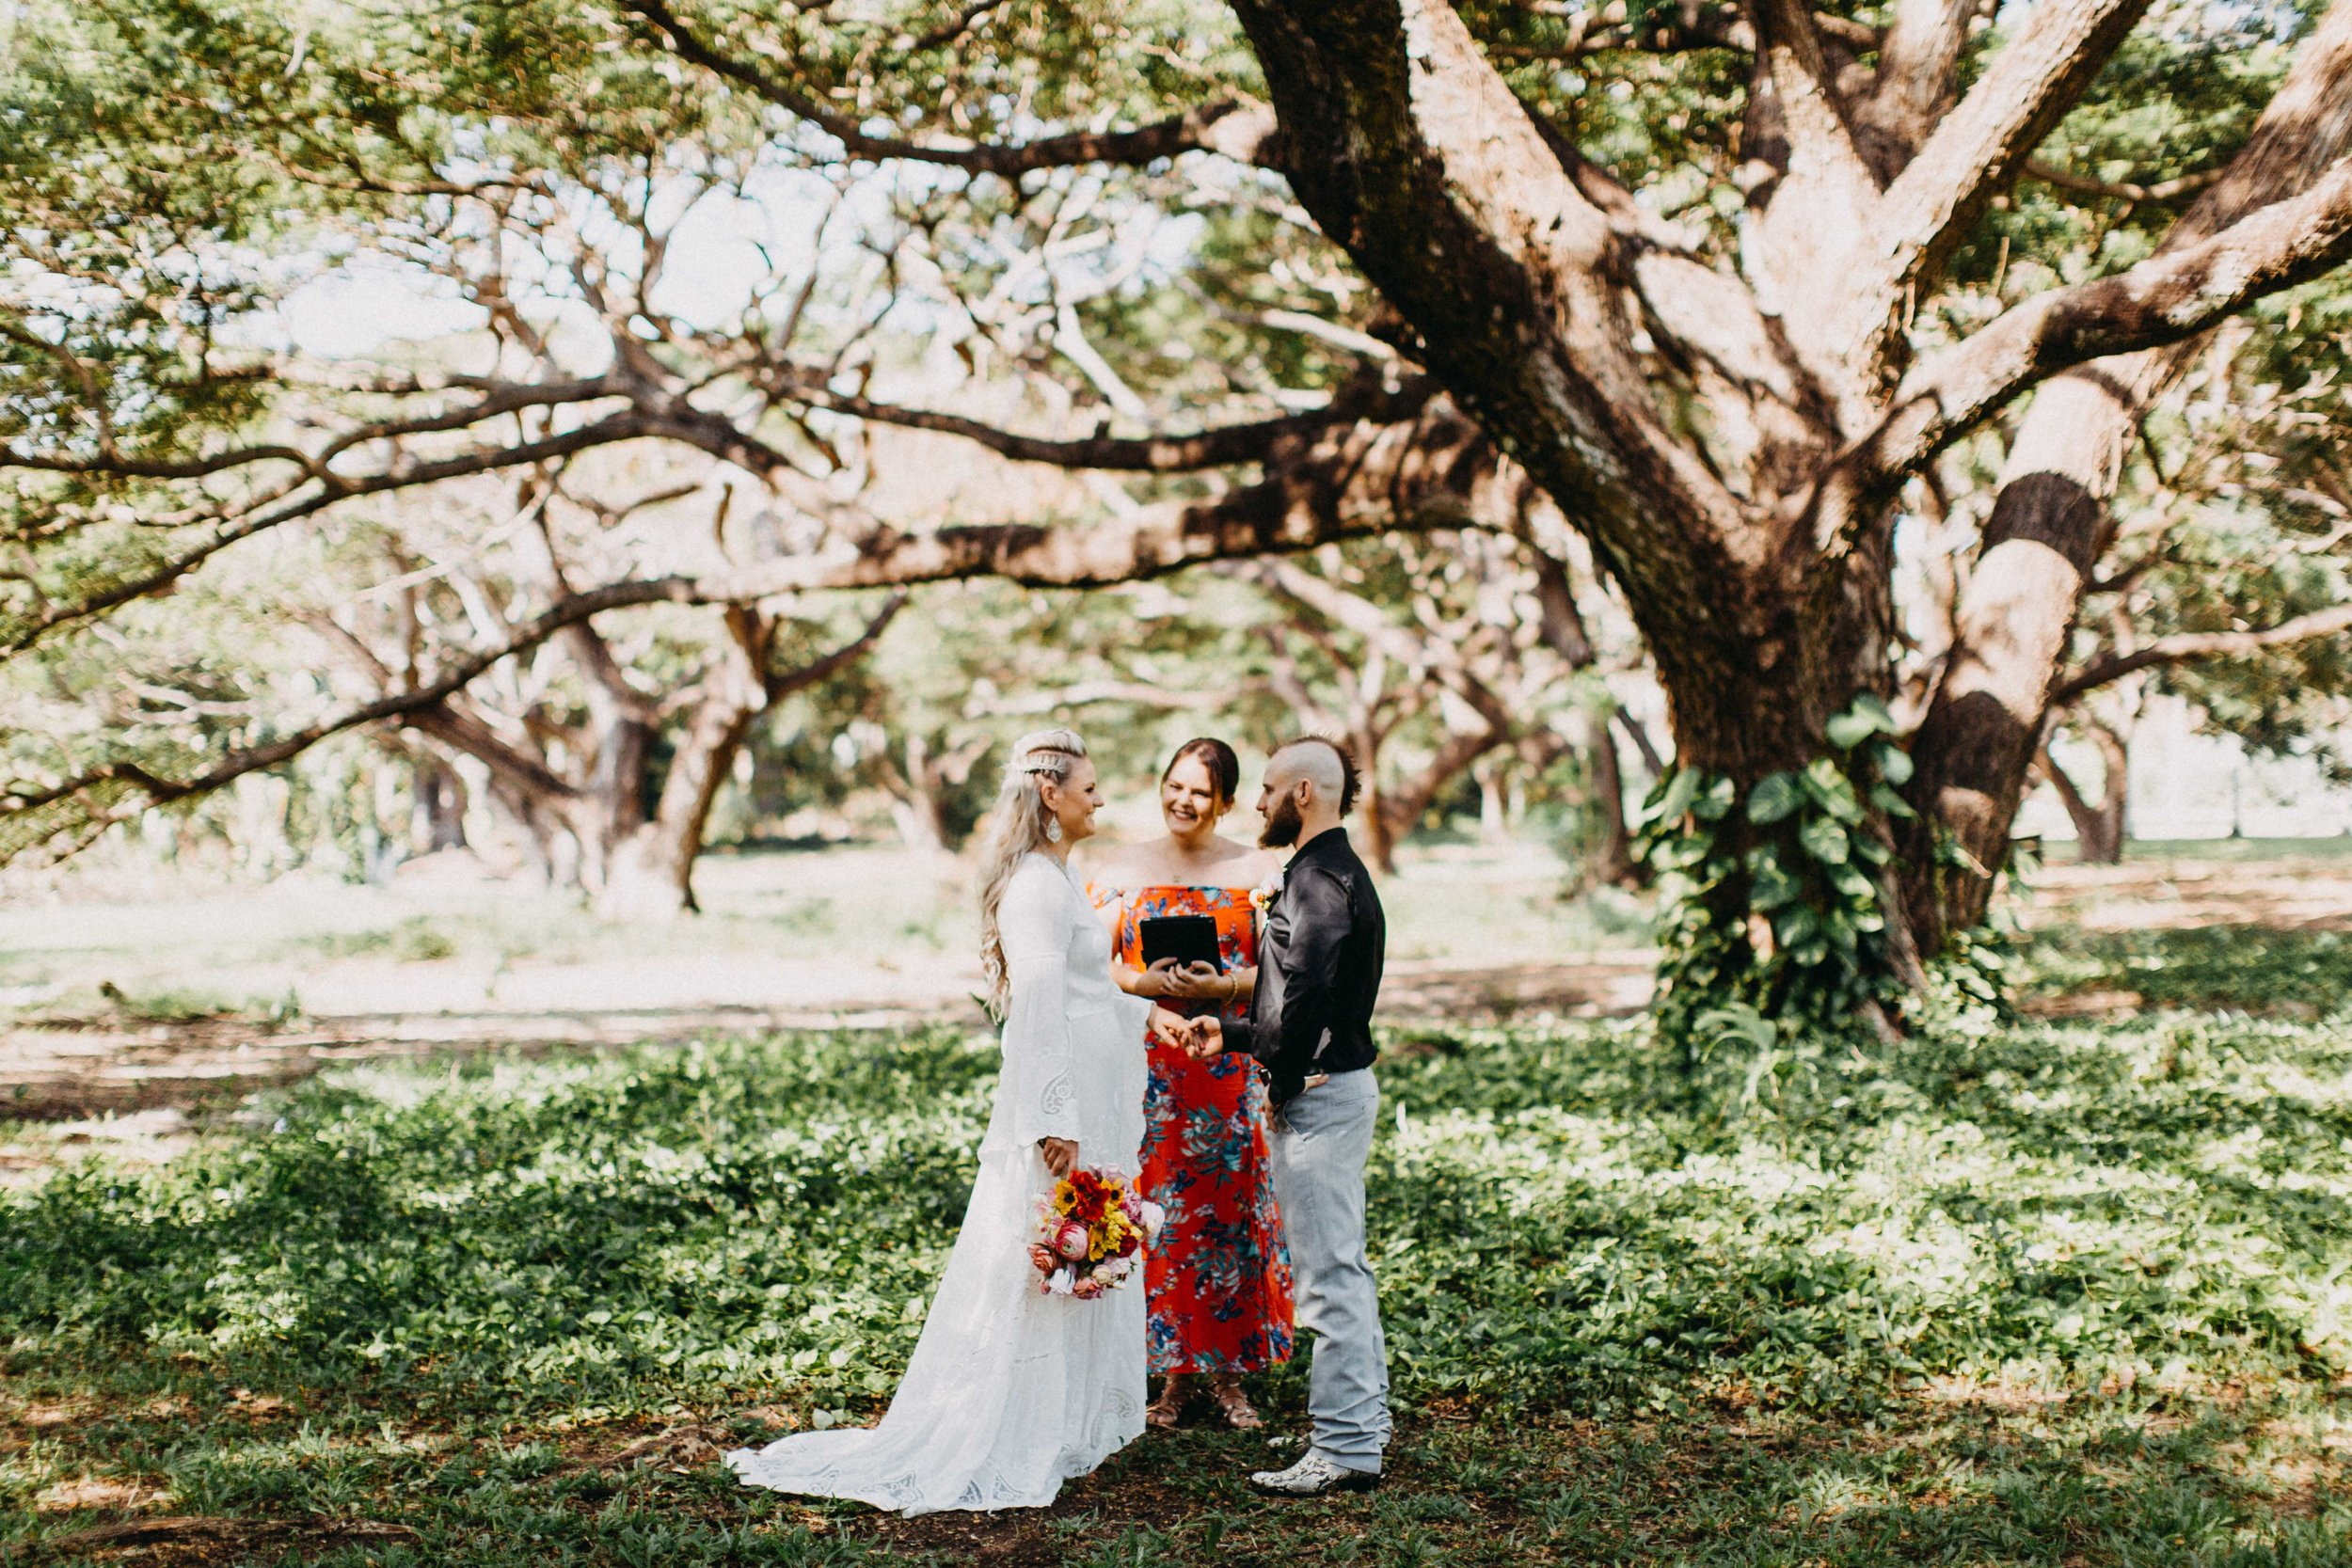 darwin-elopement-wedding-beach-camden-photography-www.emilyobrienphotography.net-8.jpg